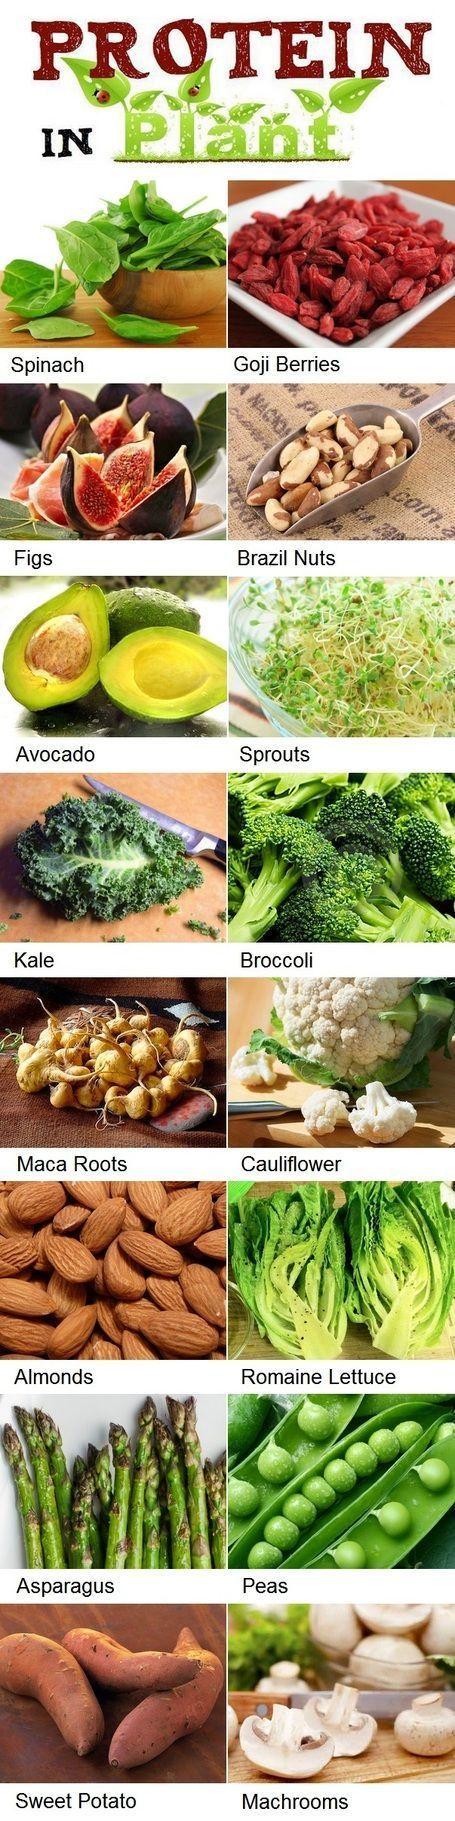 High Protein Foods List. Great for vegetarians or #MeatlessMondays